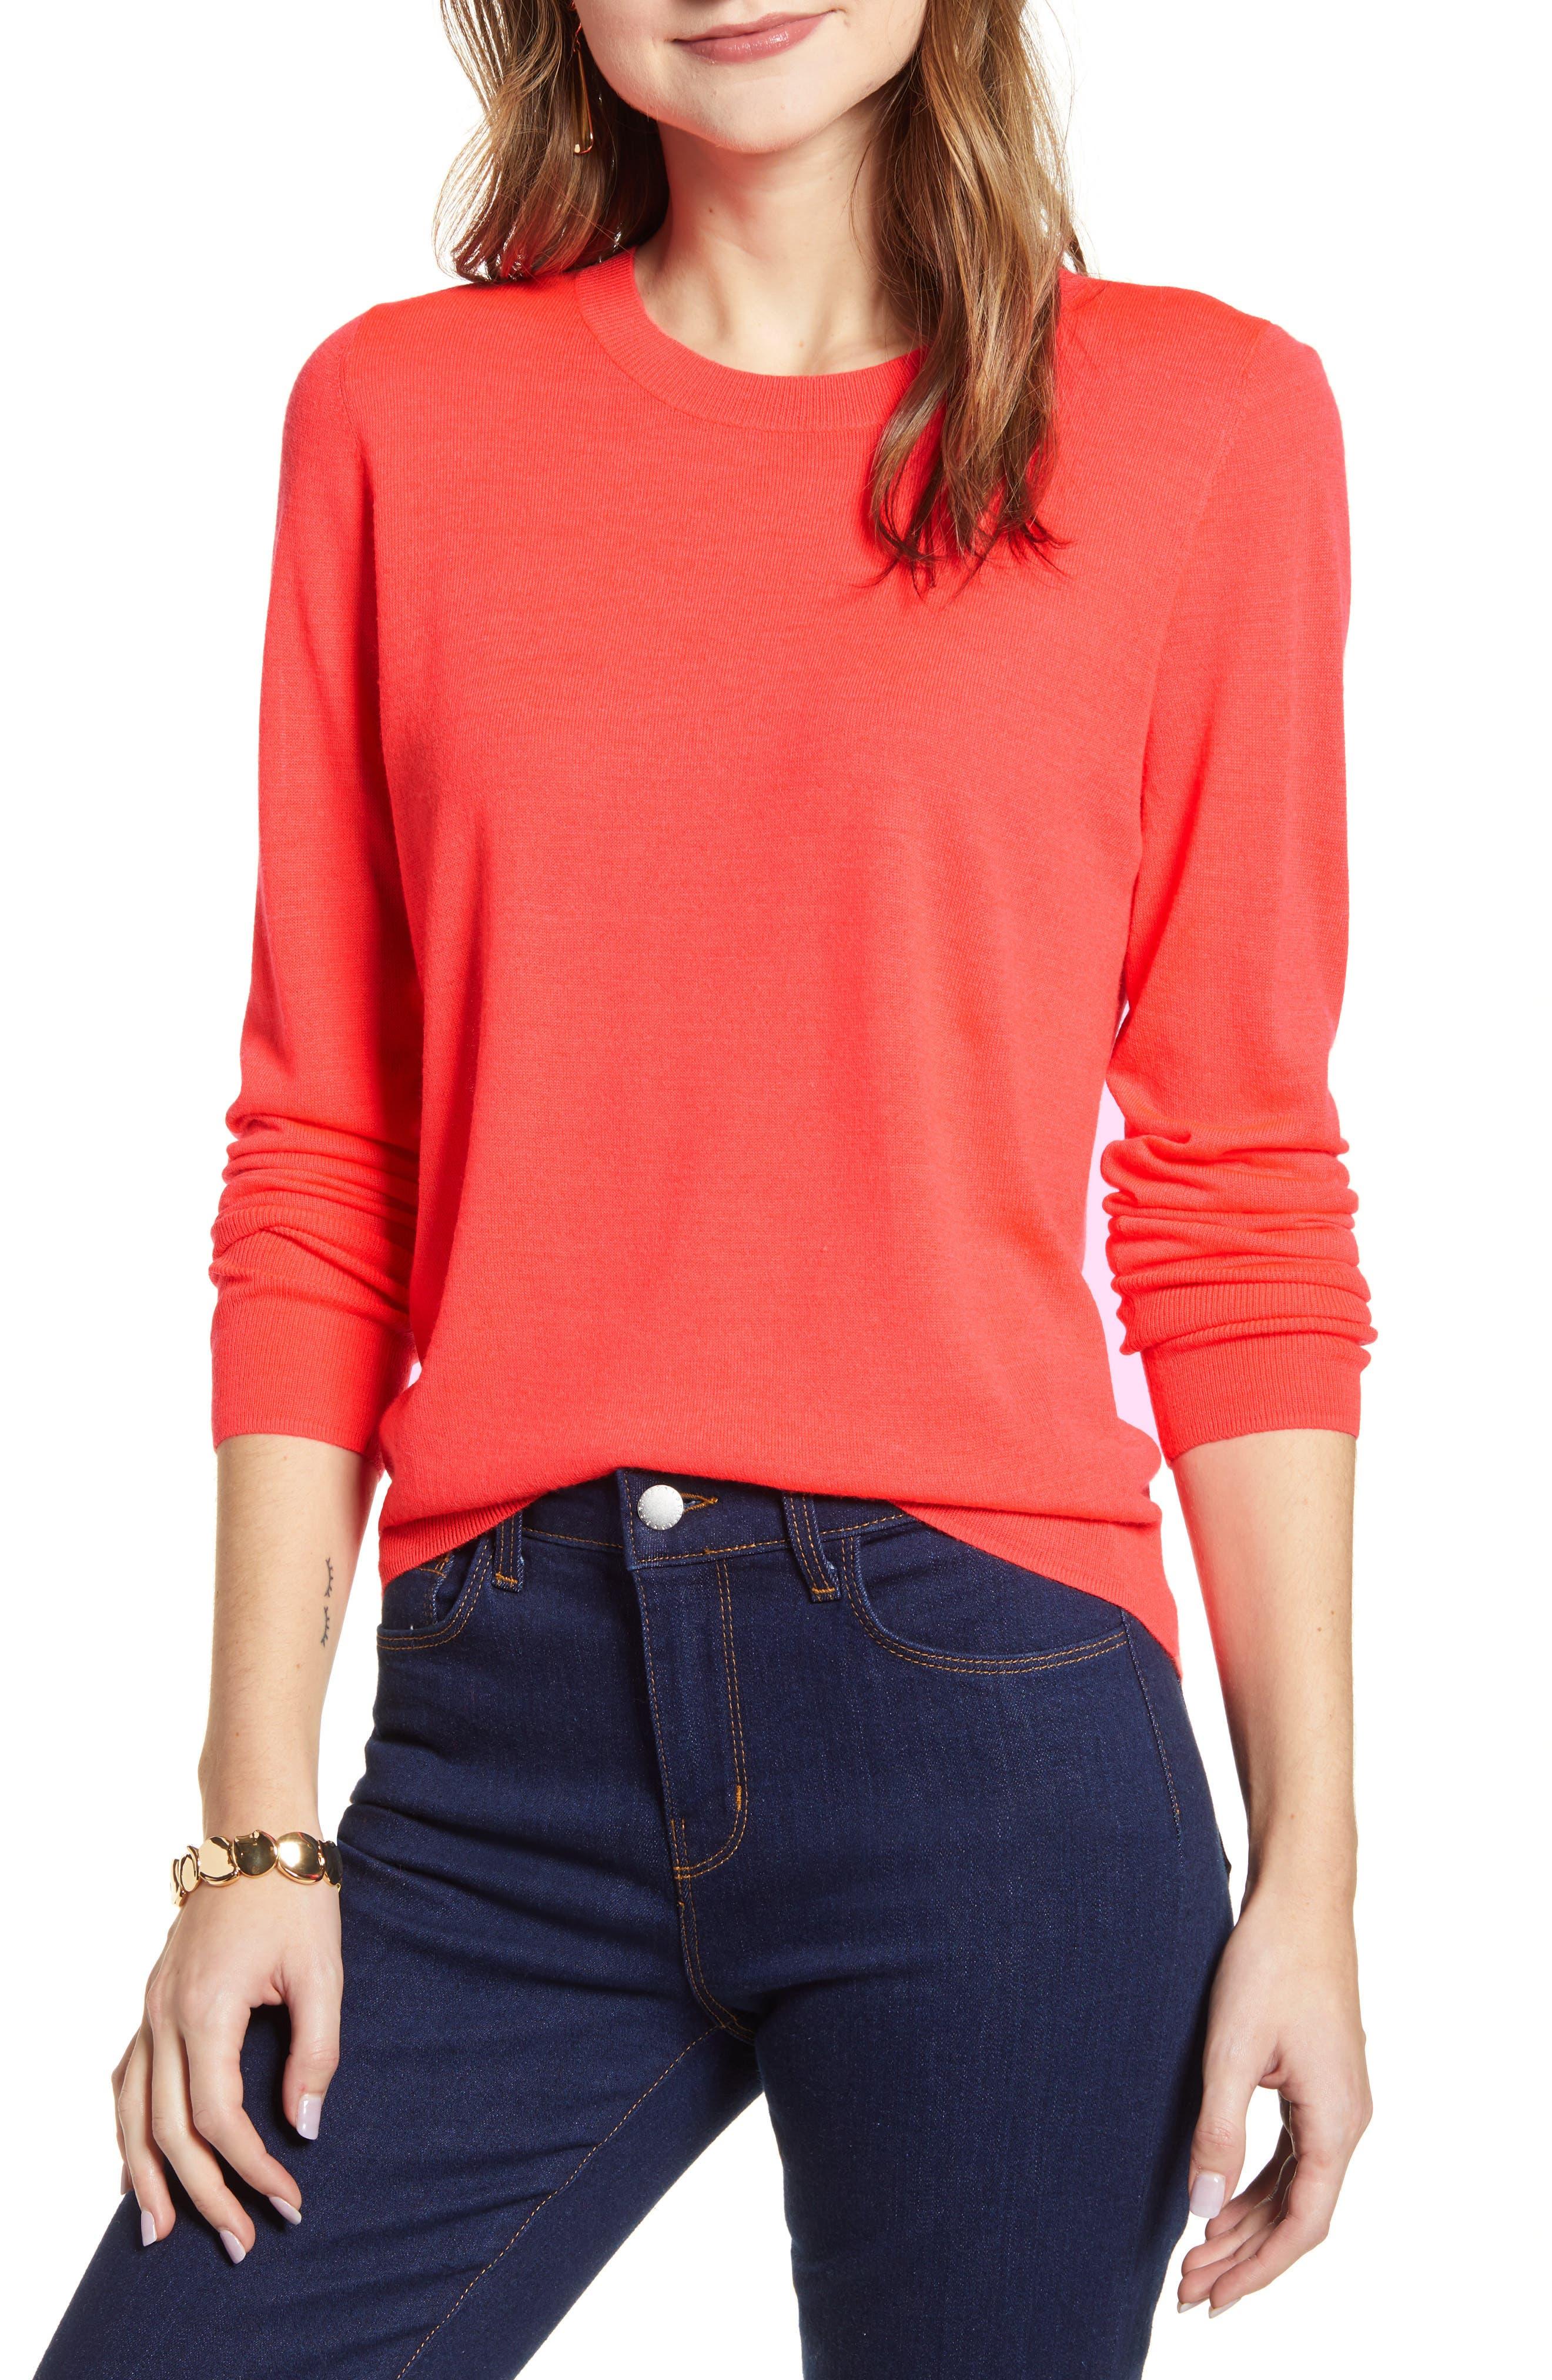 ICE Cream Womens Crew Neck Long Sleeve Casual Lightweight Pullover Print Sweatshirt Tops for Sport